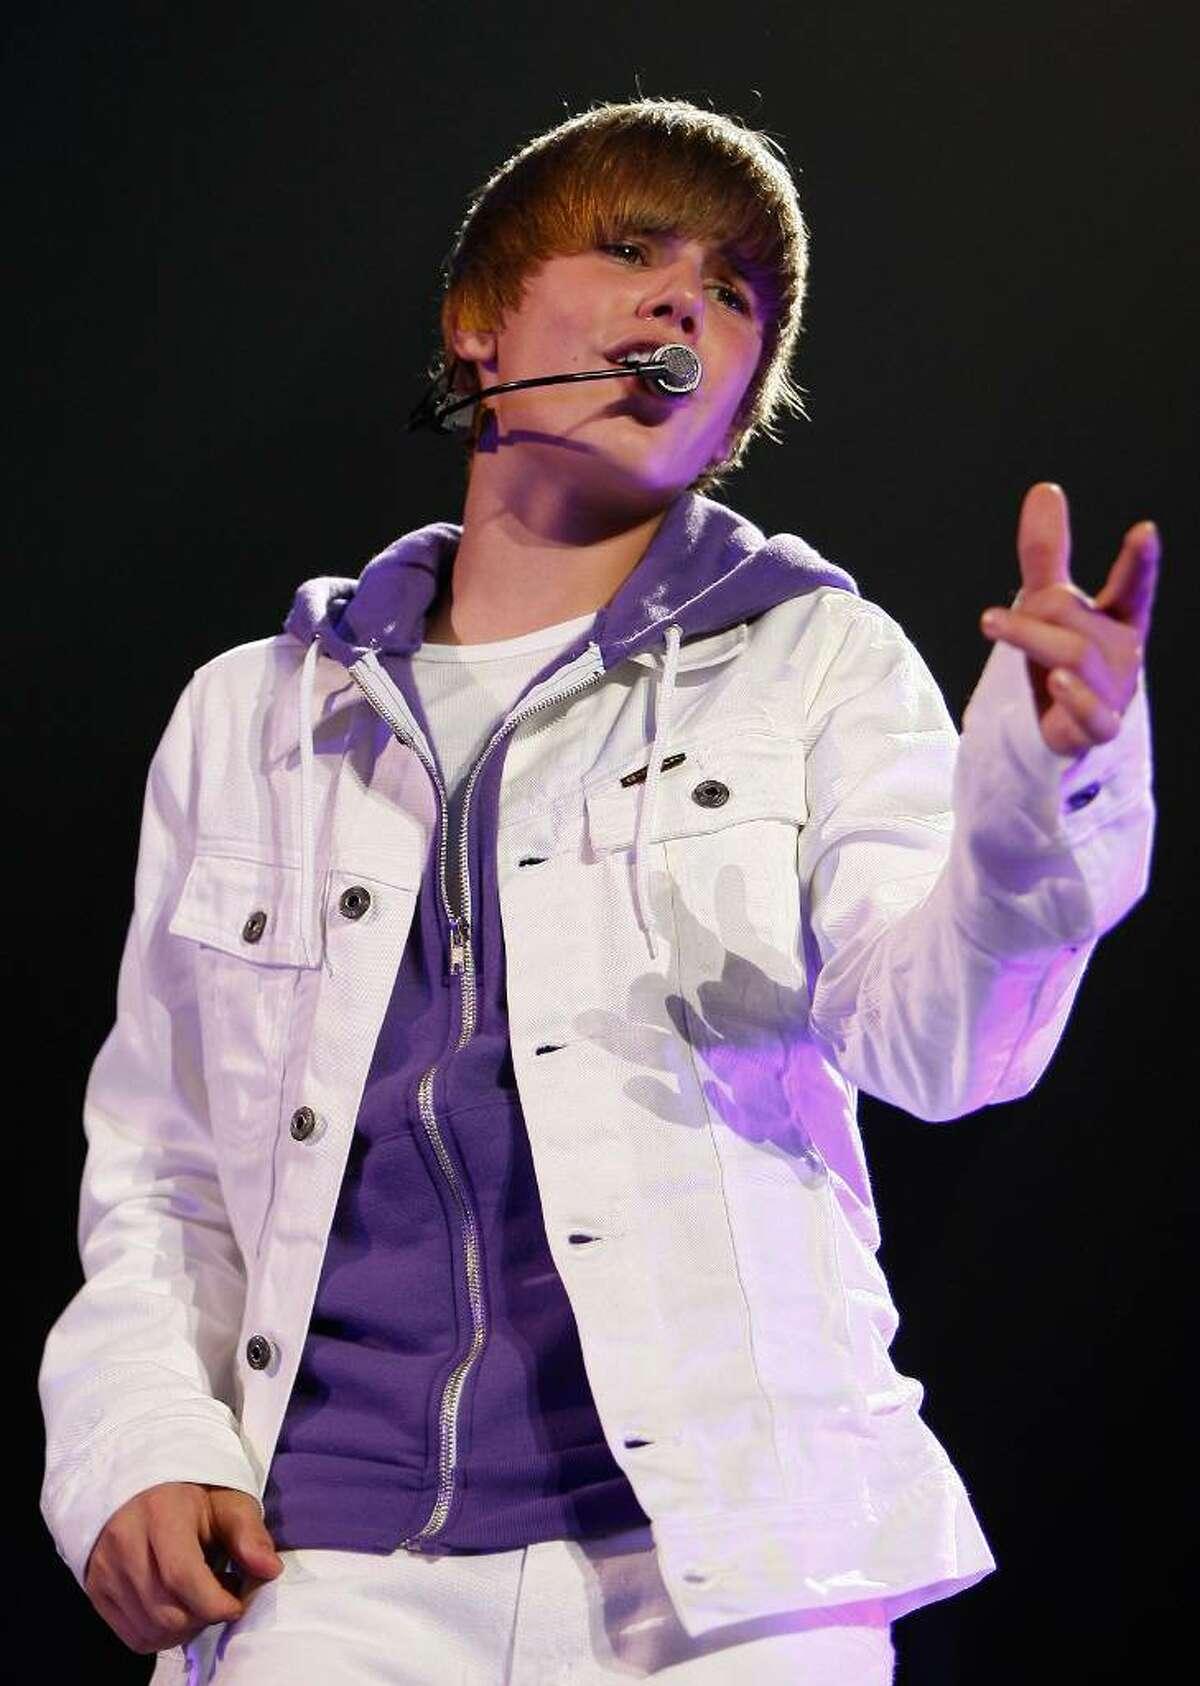 In this June 24, 2010, file photo, Justin Bieber performs in Trenton, N.J. (Tim Larsen / Associated Press)